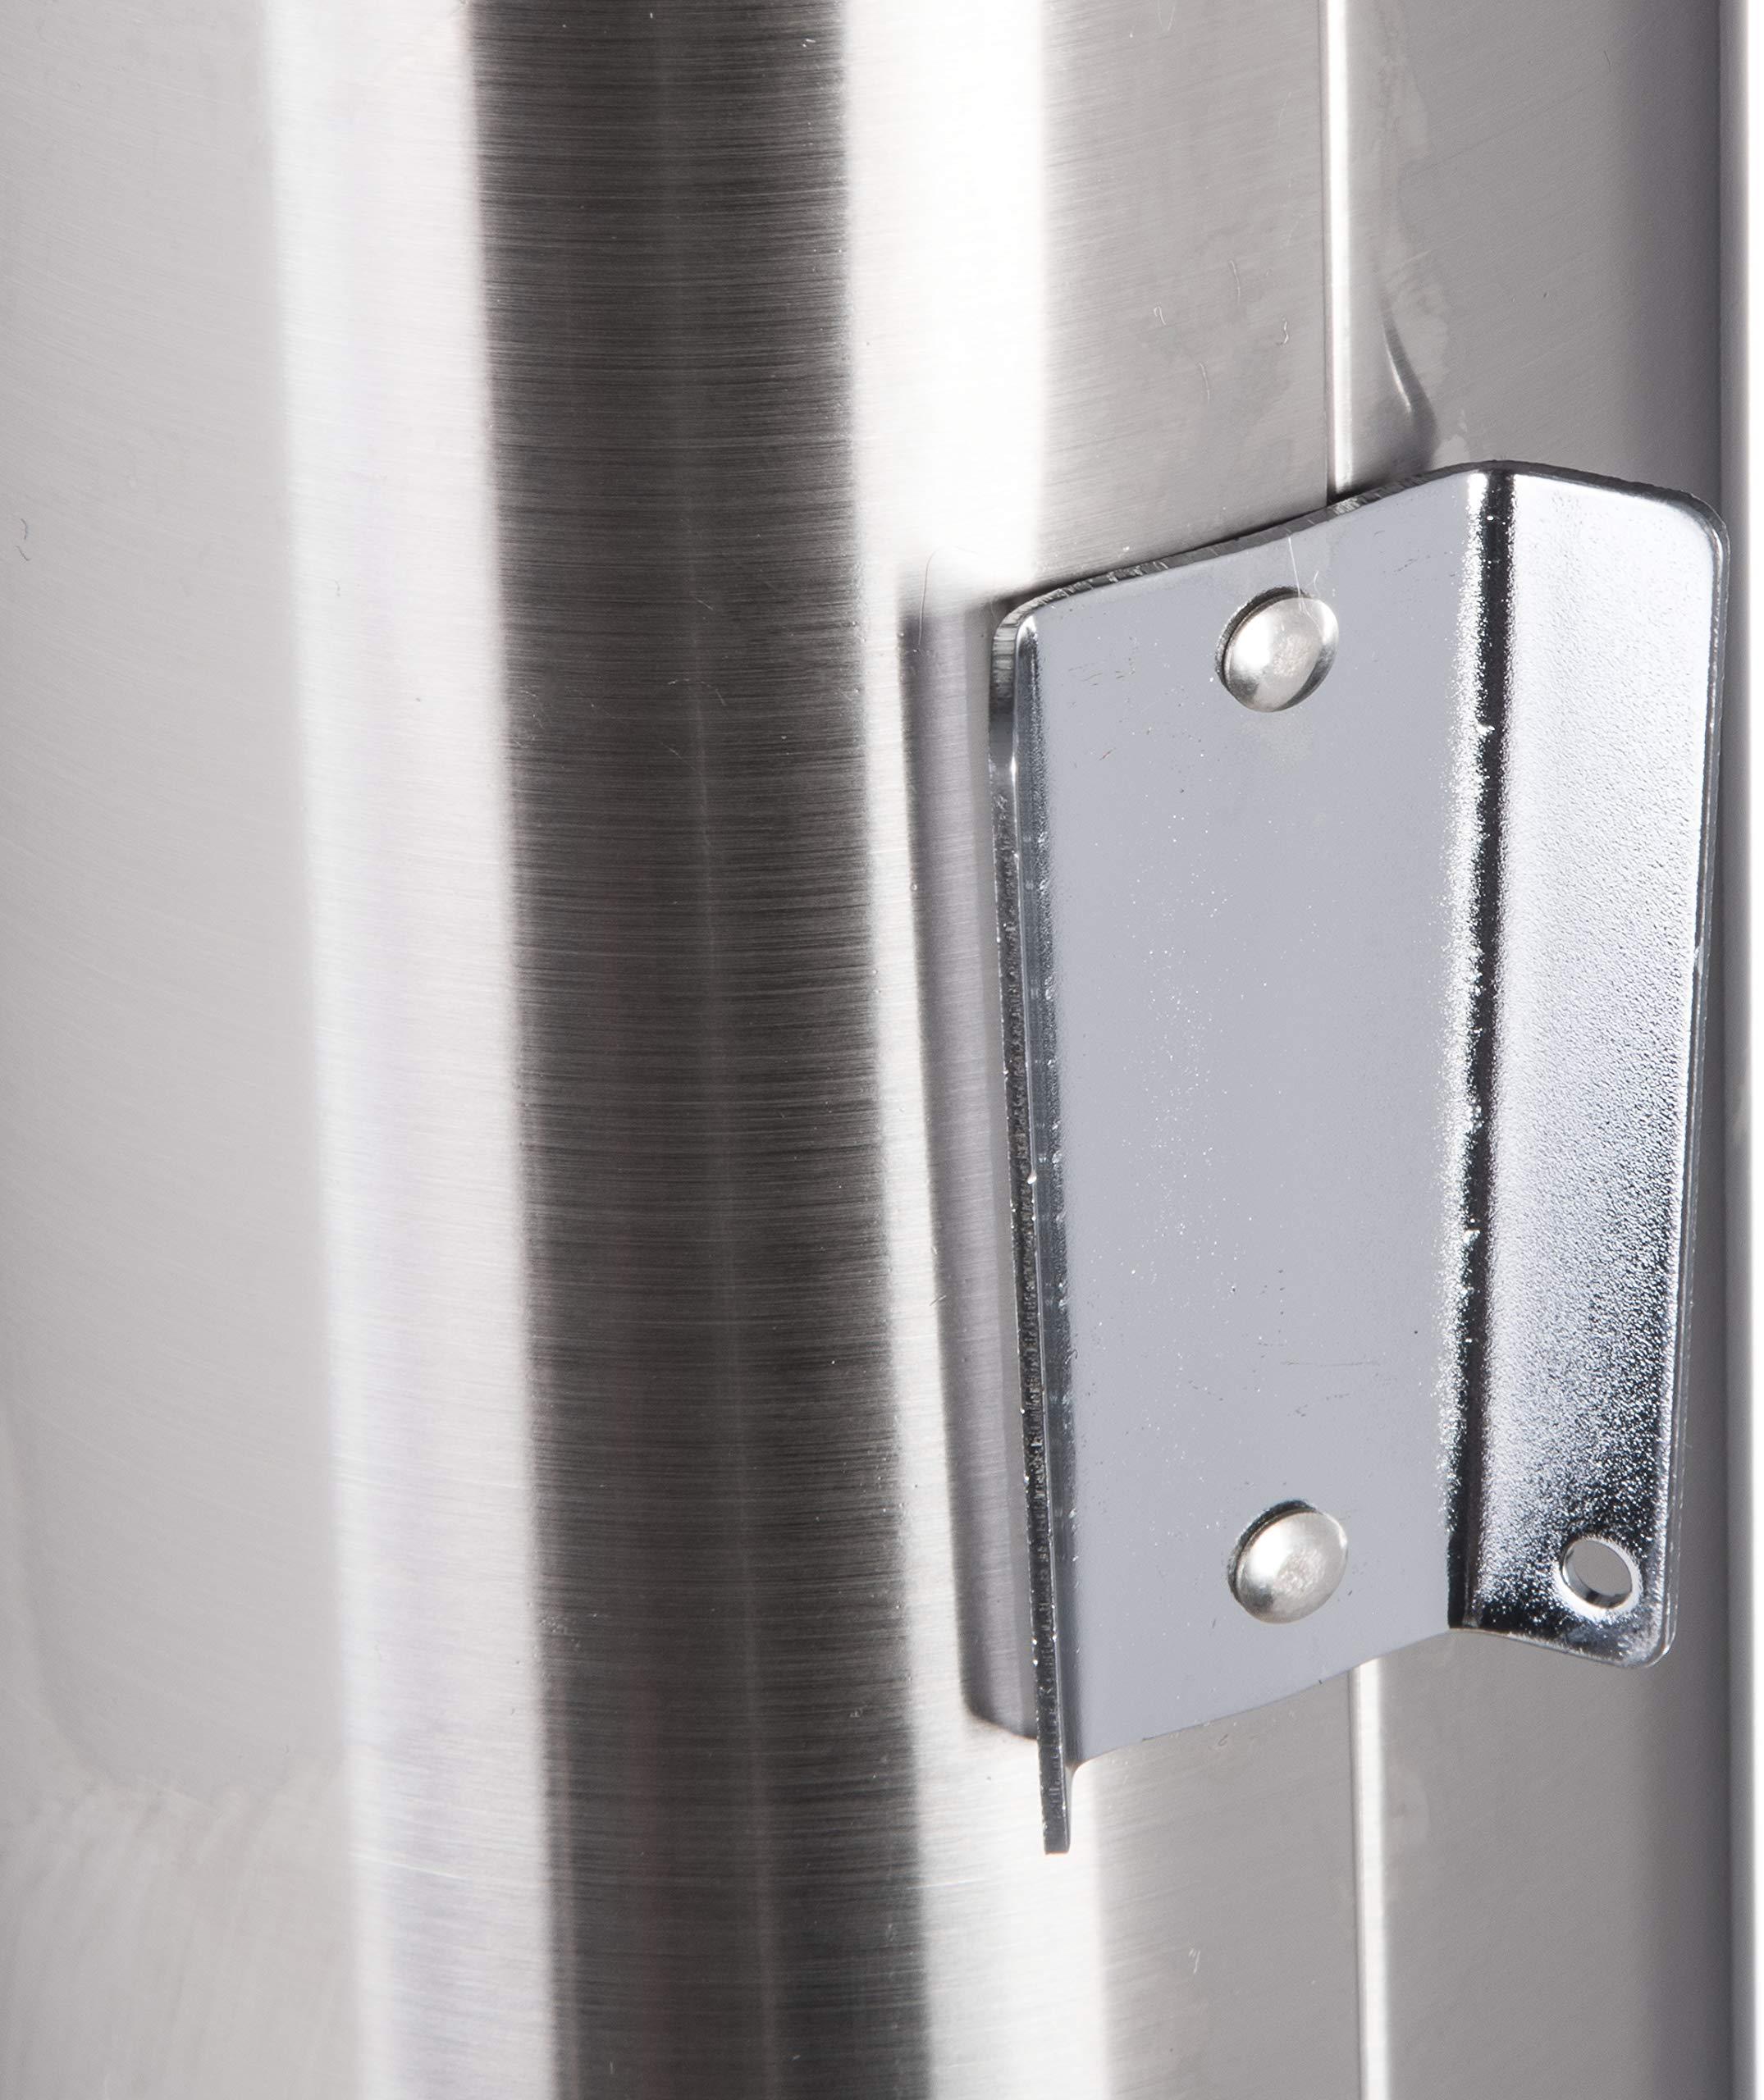 San Jamar C3400P 12-24 oz Stainless Steel Pull Type Beverage Cup Dispenser...